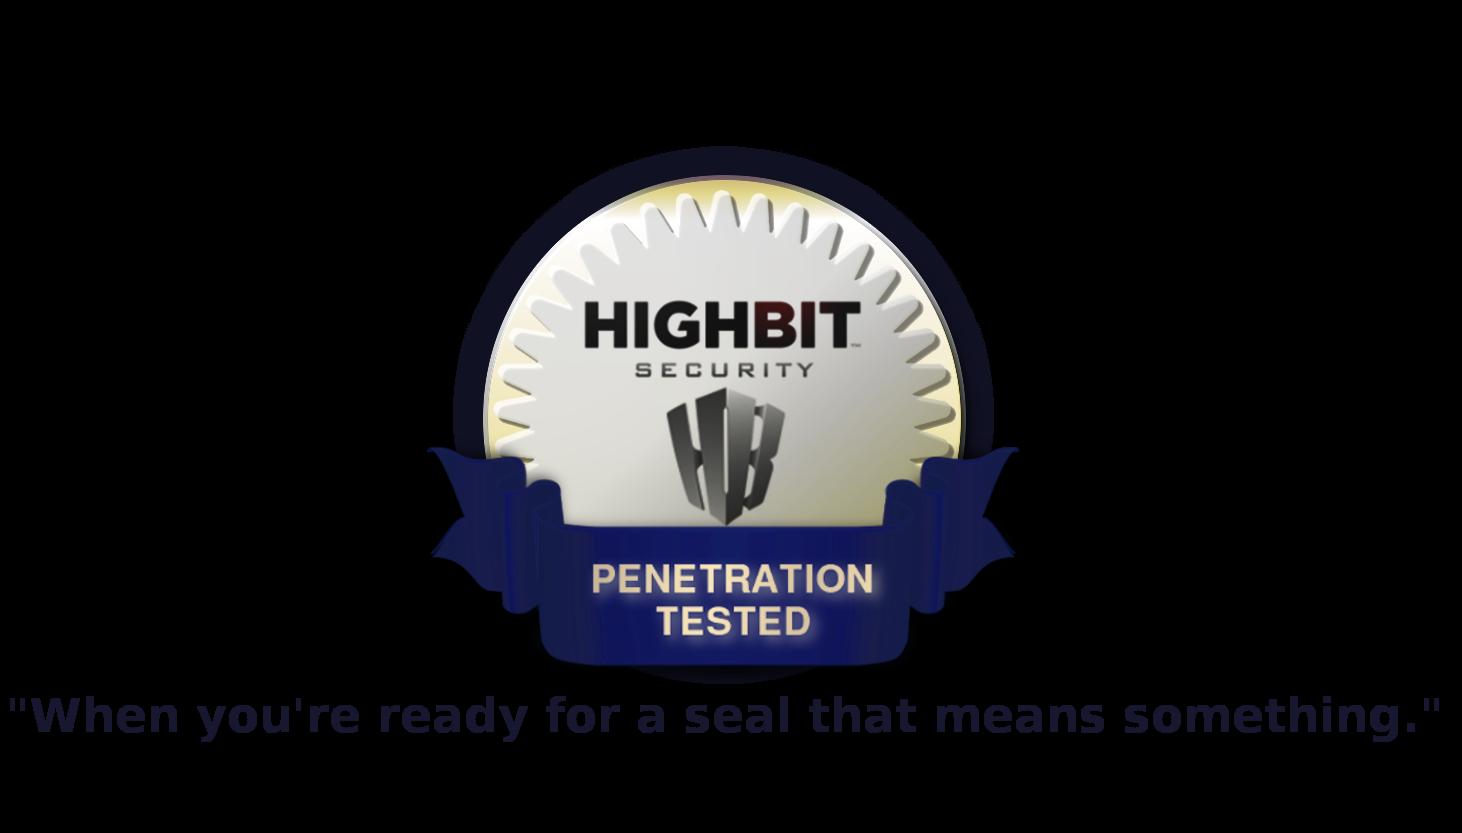 Standard penetration test cost